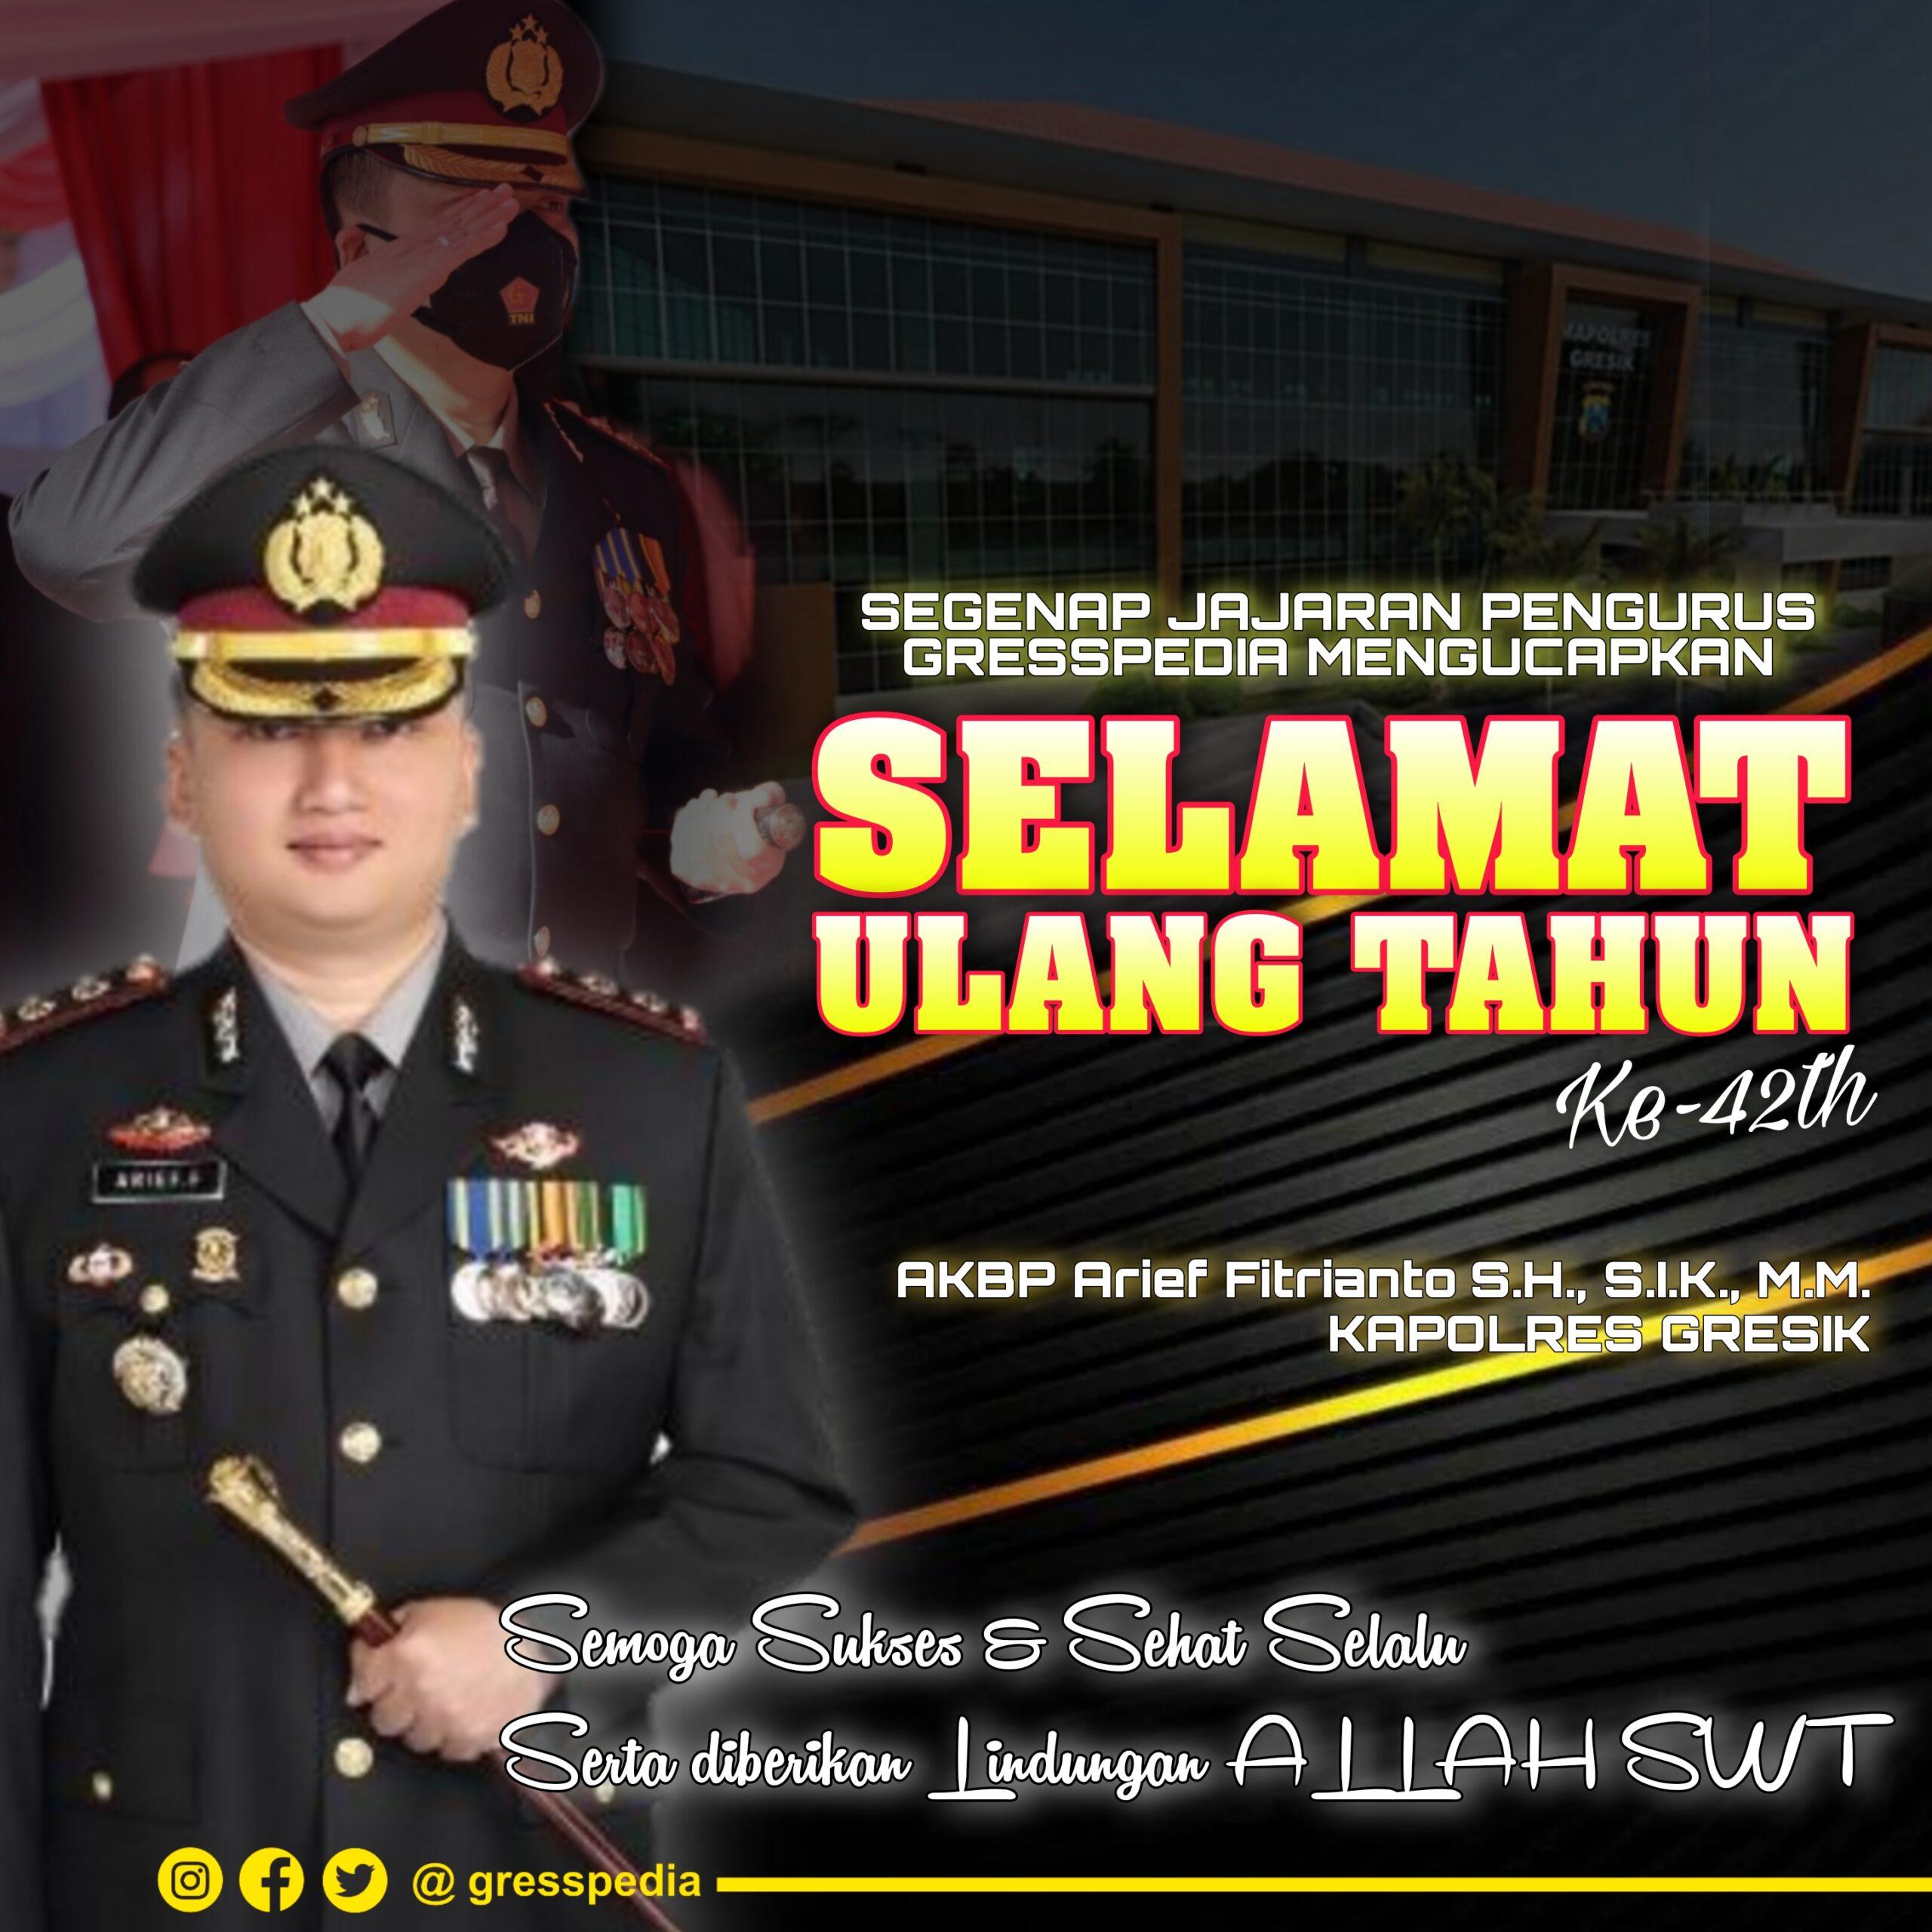 Selamat Ulang Tahun Kapolres Gresik AKBP Arief Fitrianto ke 42